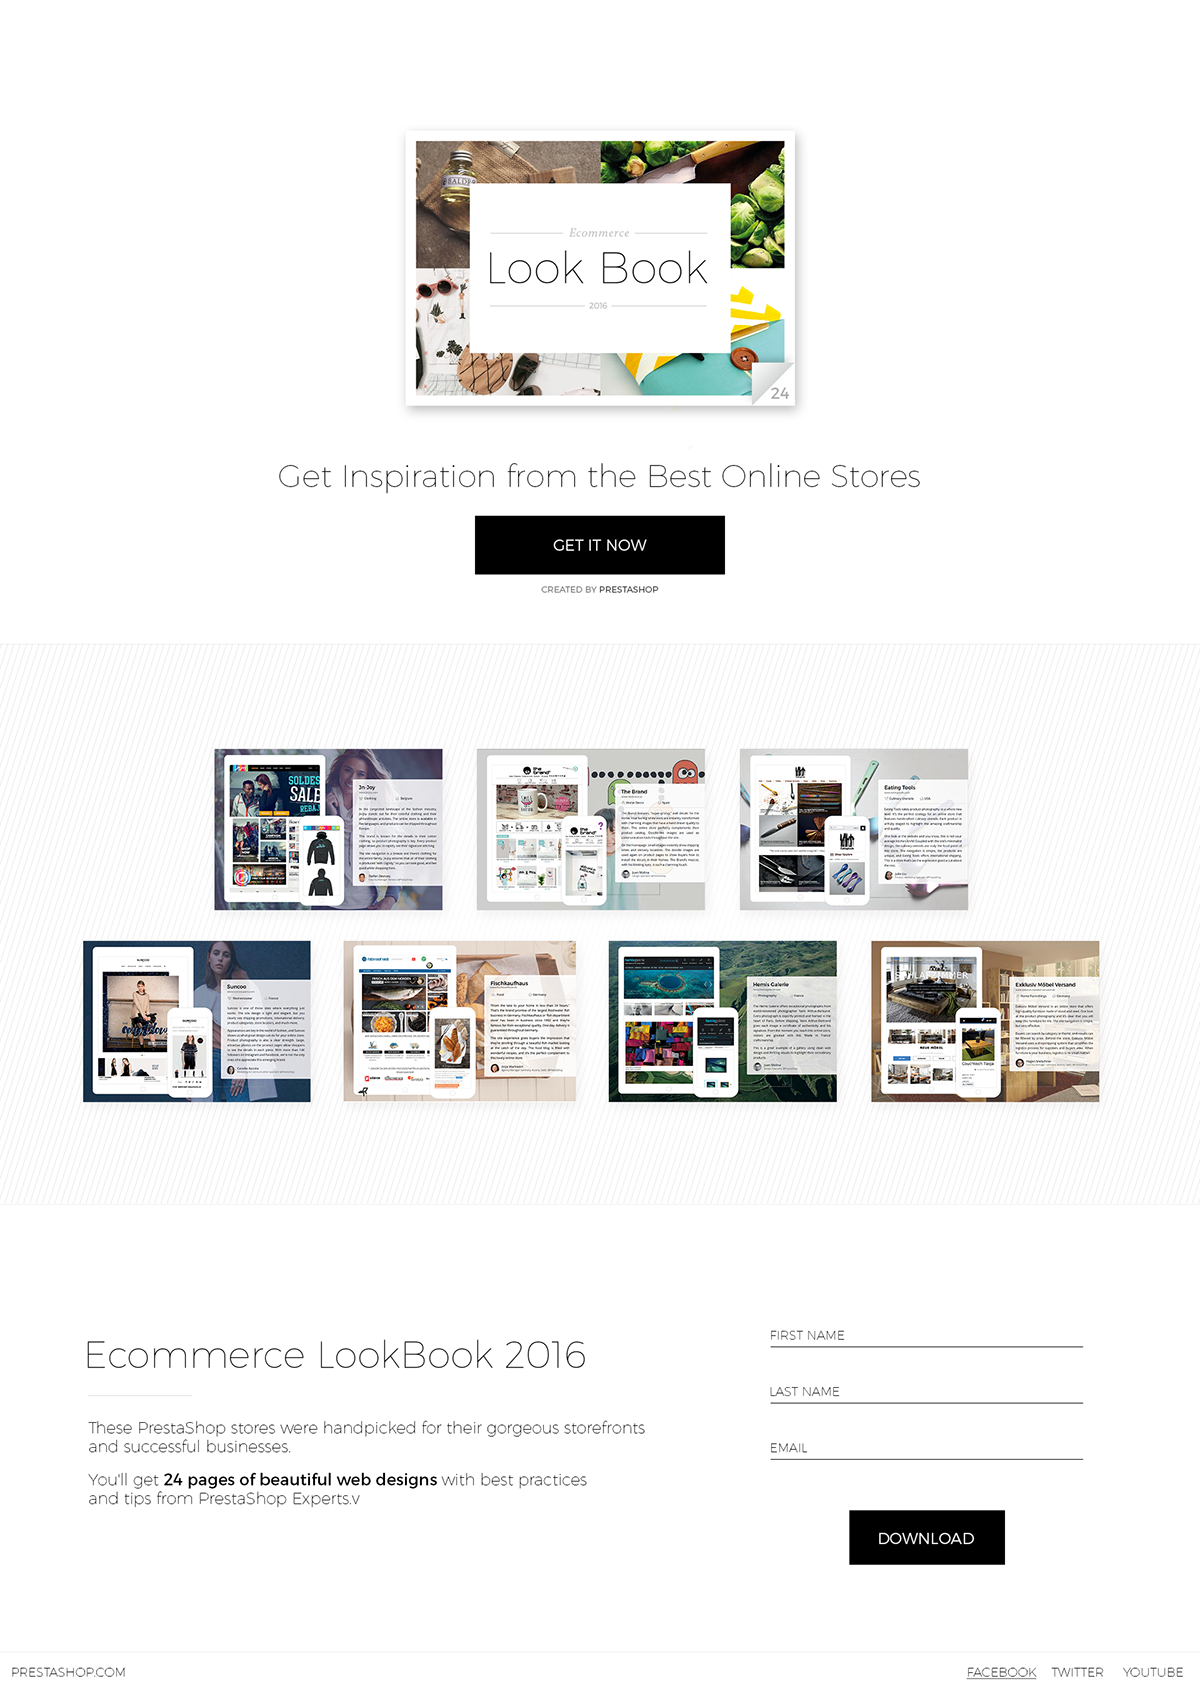 Ecommerce Lookbook Website landing page